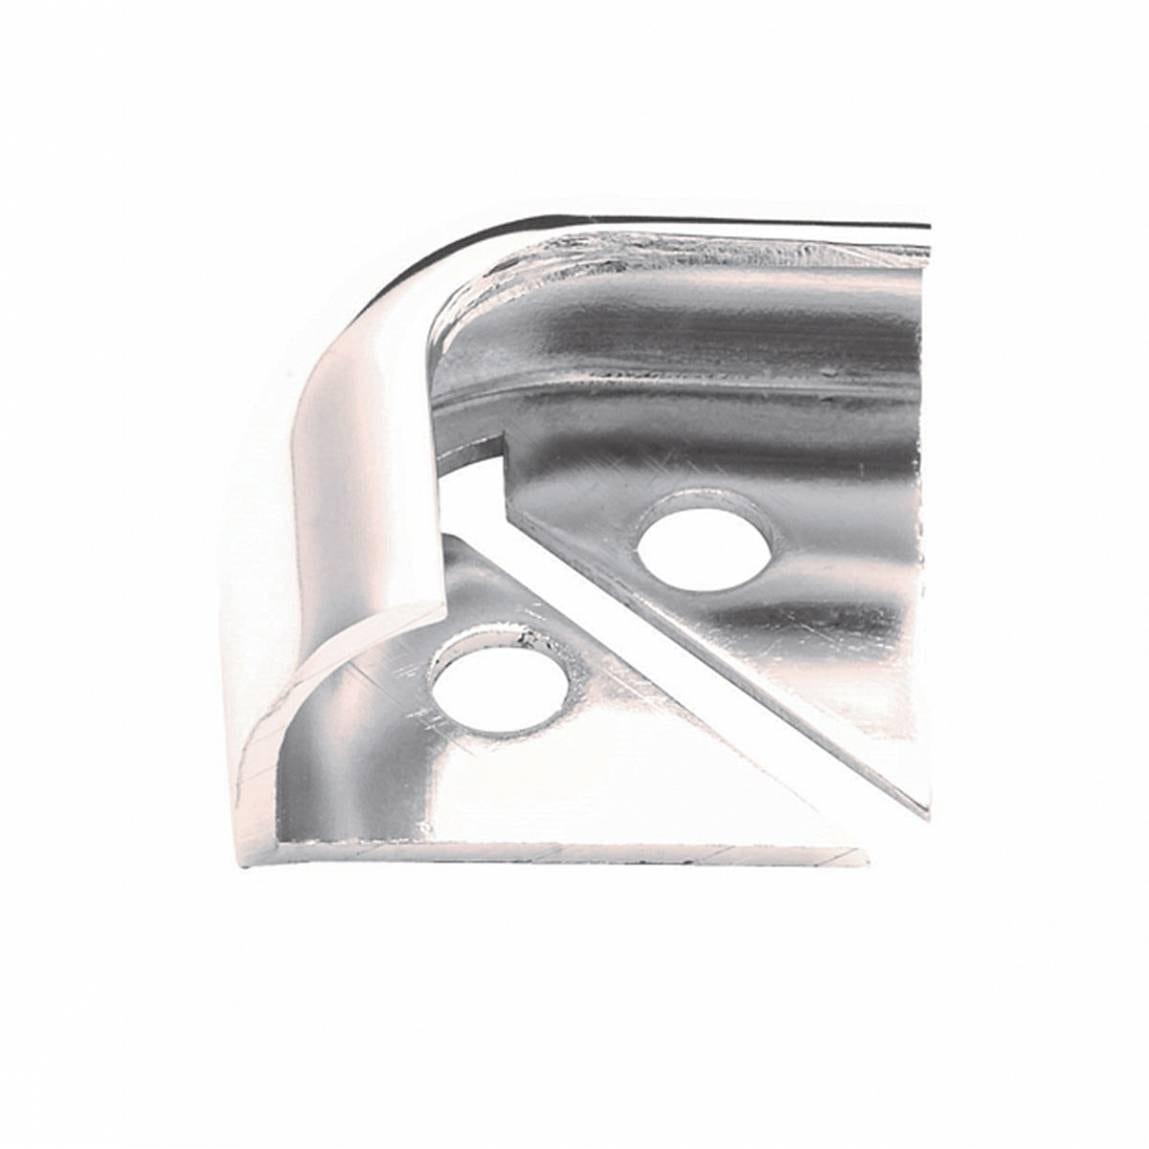 Aluminium Silver Effect Trim Corners (Pack of 2)